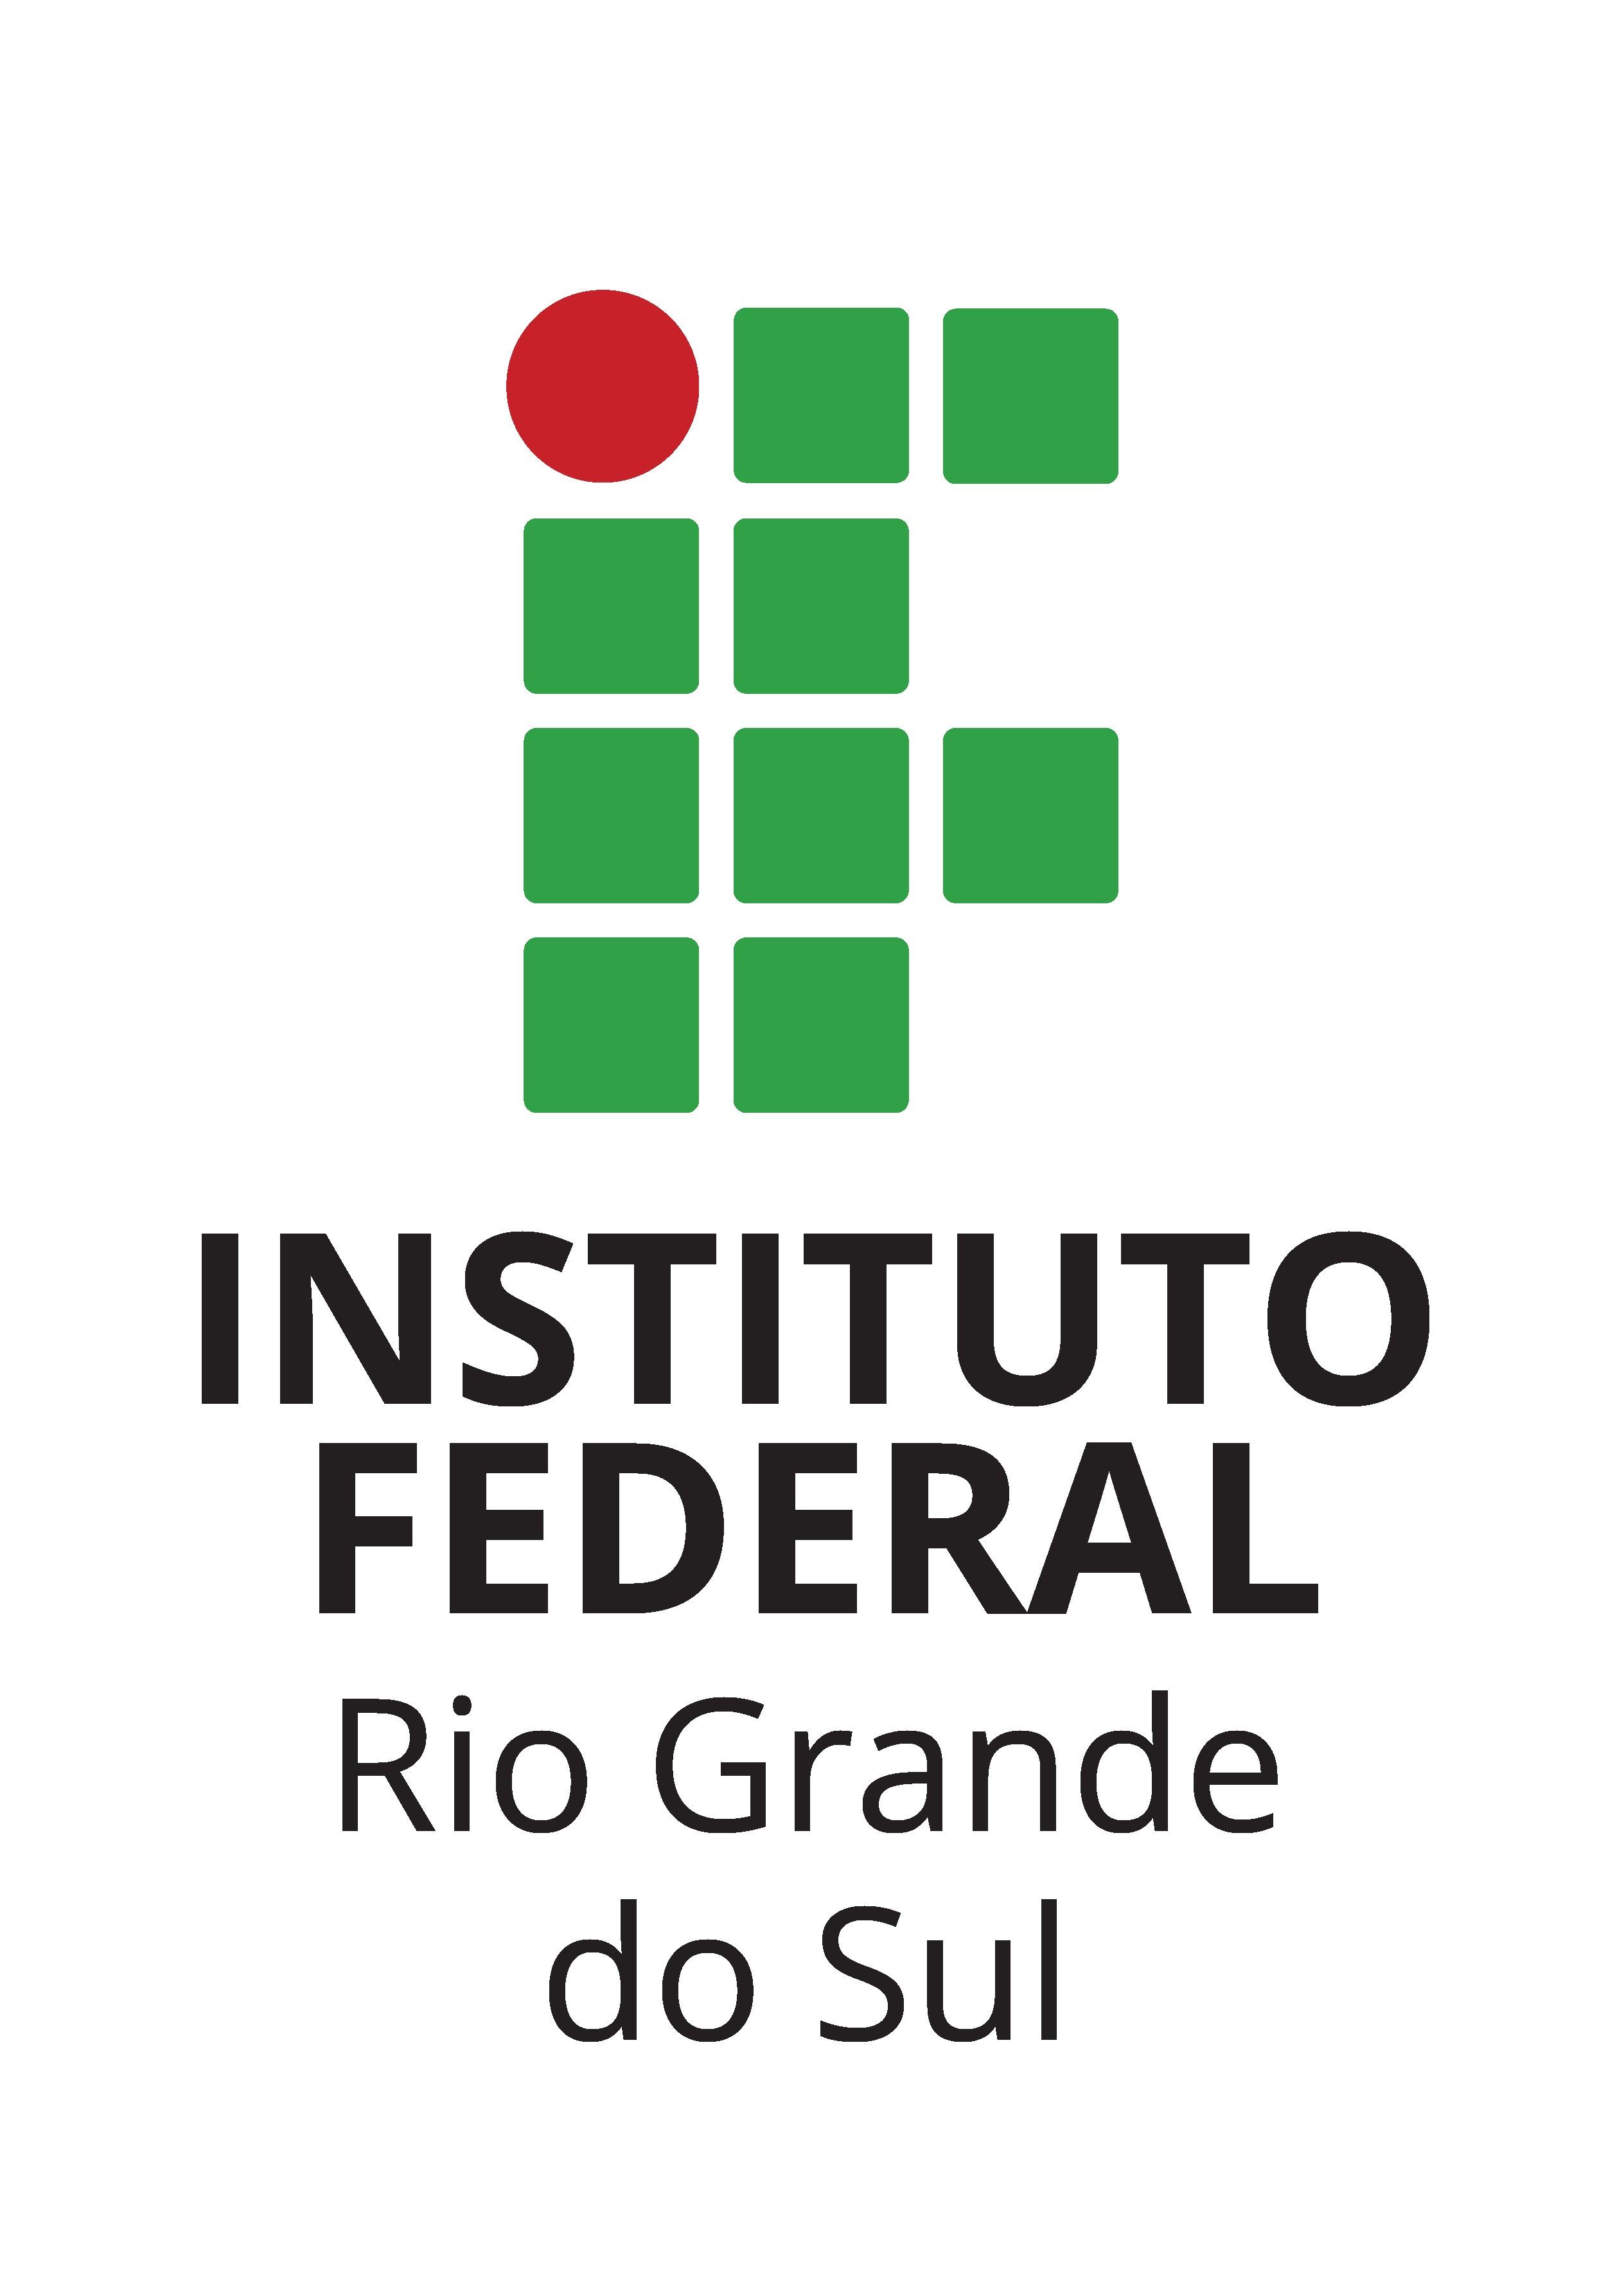 Calendario Imprimir Janeiro 2019 Actual Instituto Federal Do Rio Grande Do Sul ifrs